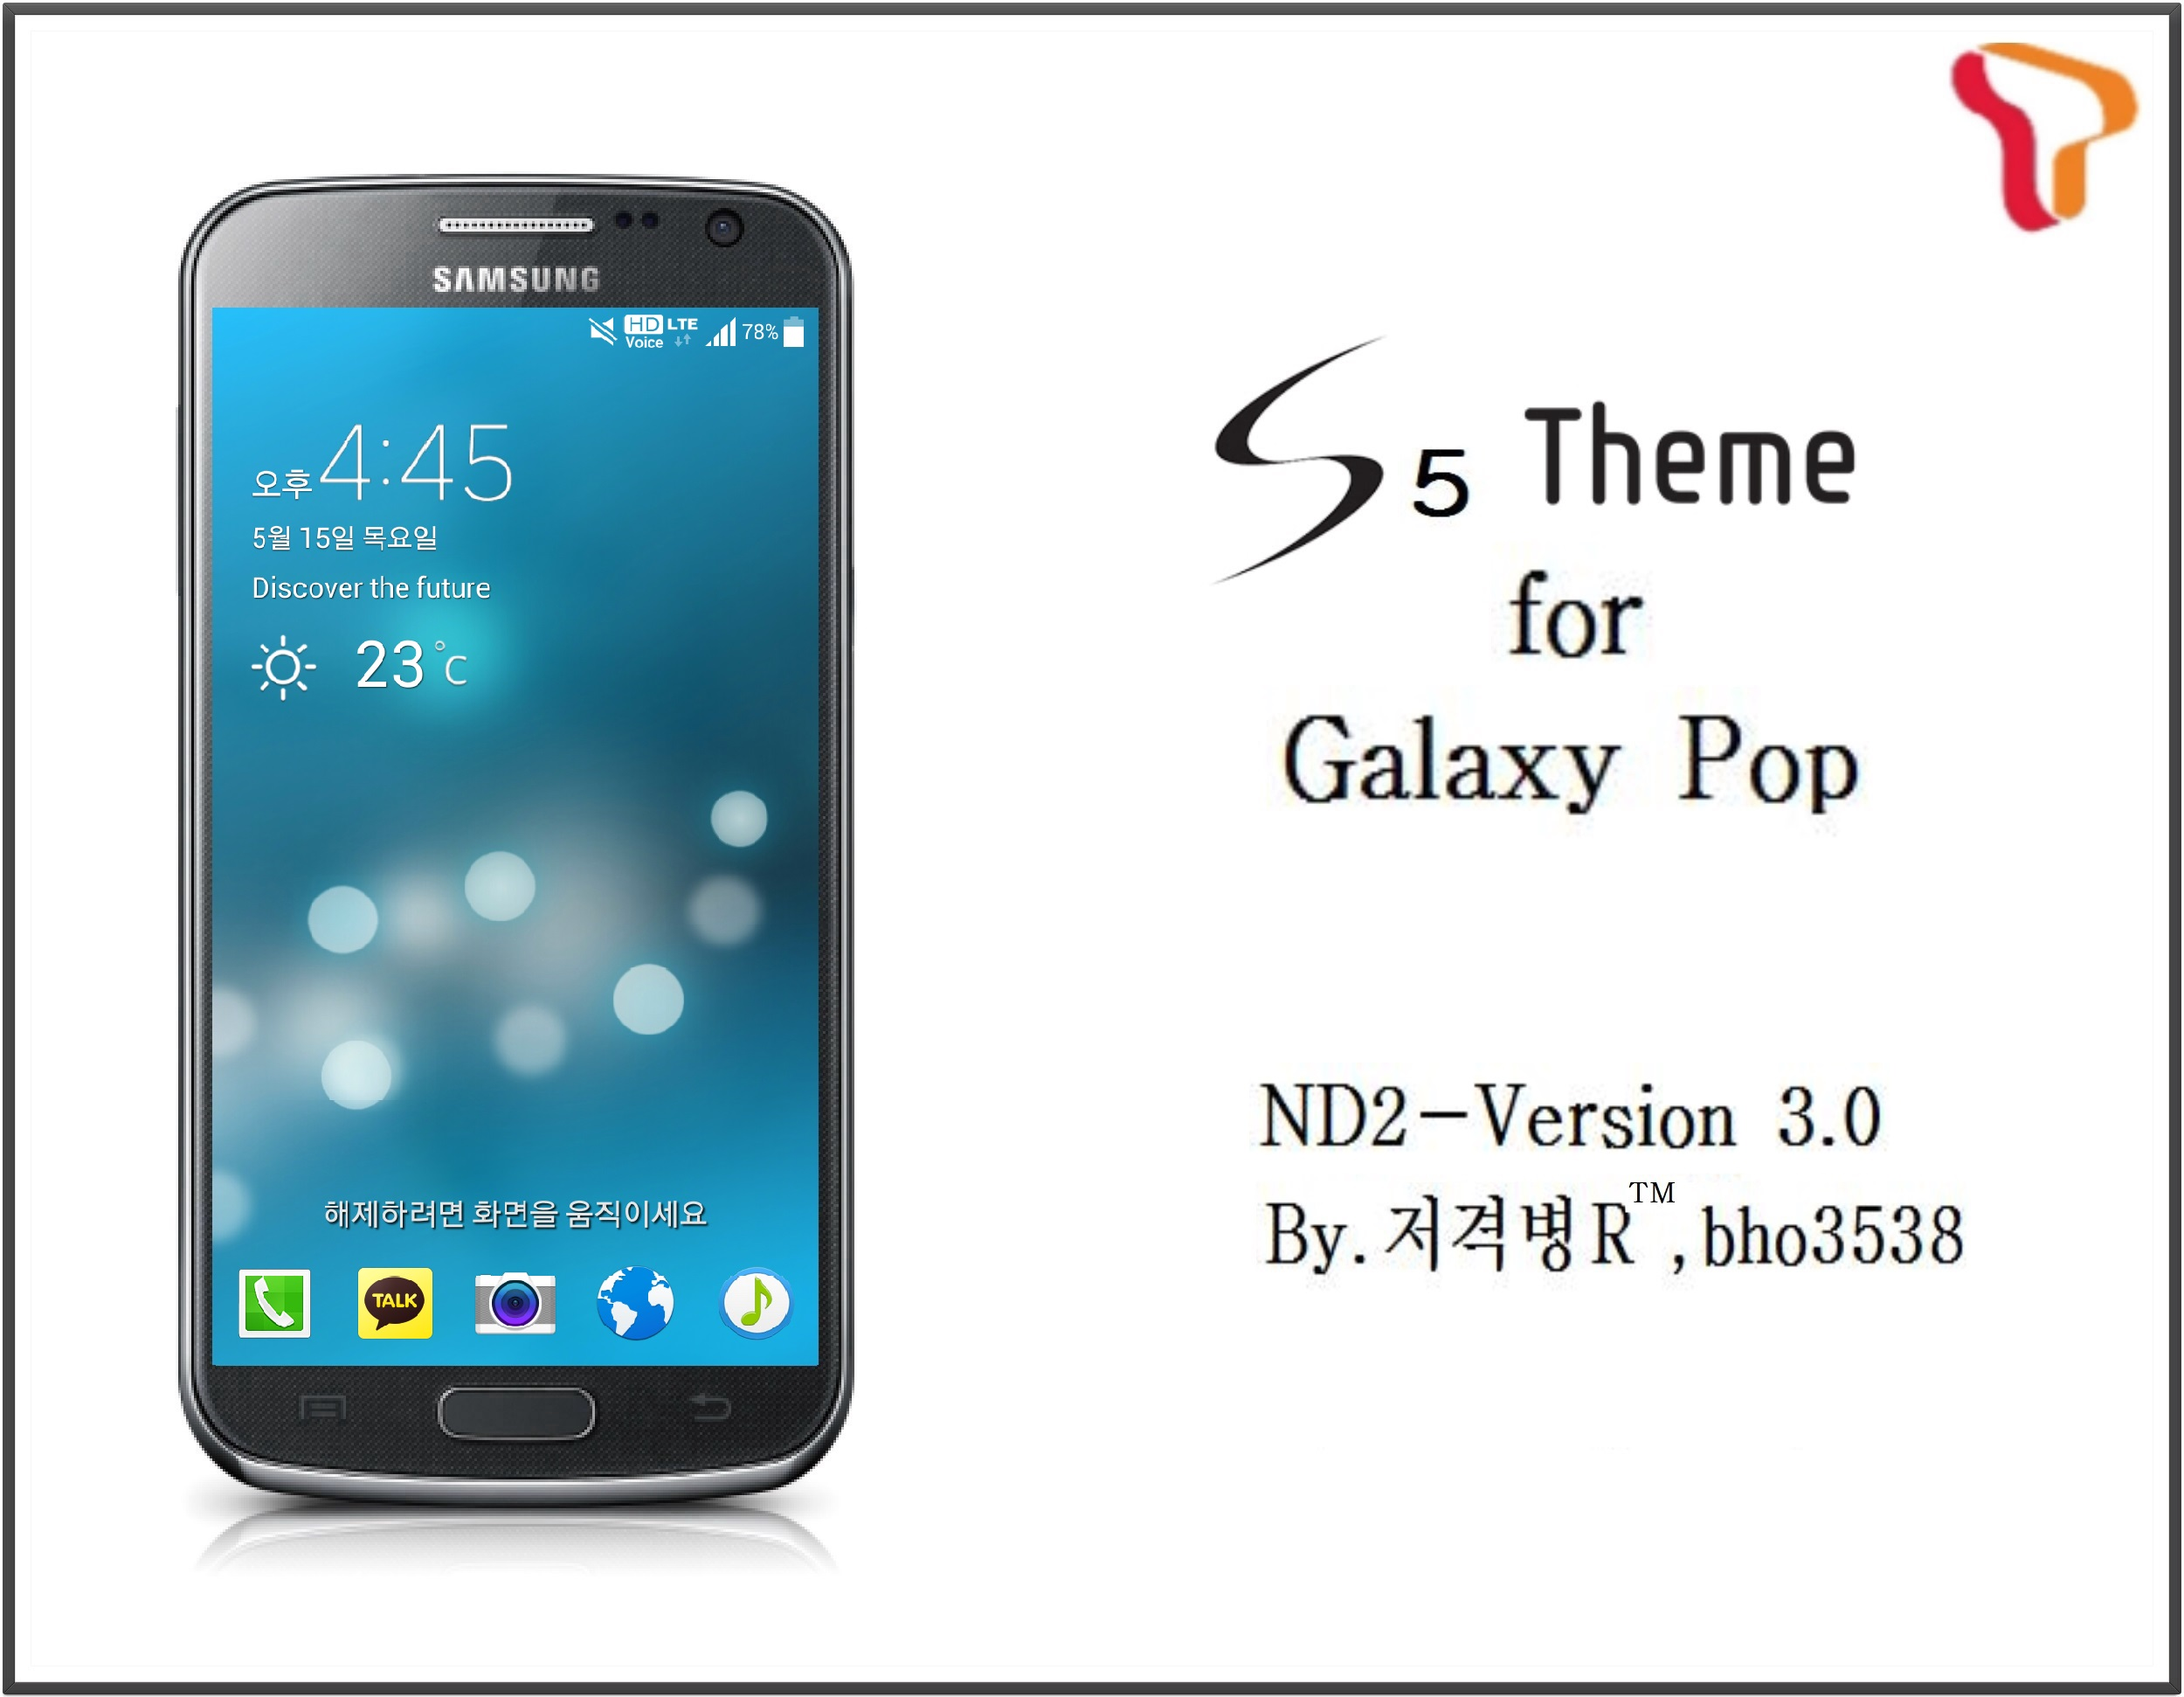 samsung galaxy pop r5570 themes